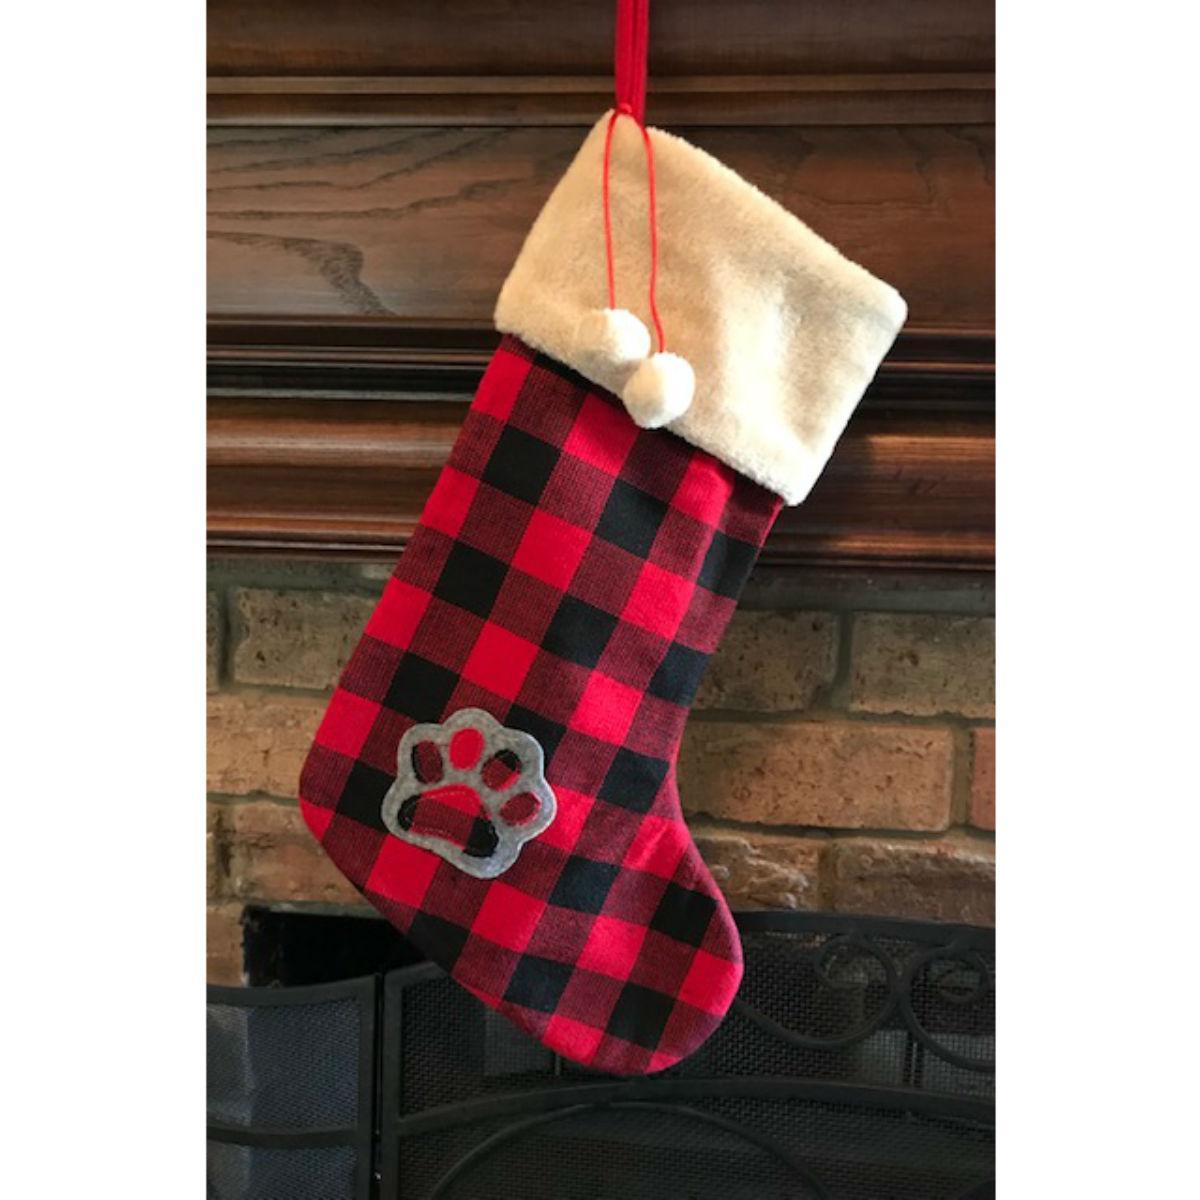 Dallas Dogs Buffalo Plaid Christmas Stocking - Paw & Pom Poms